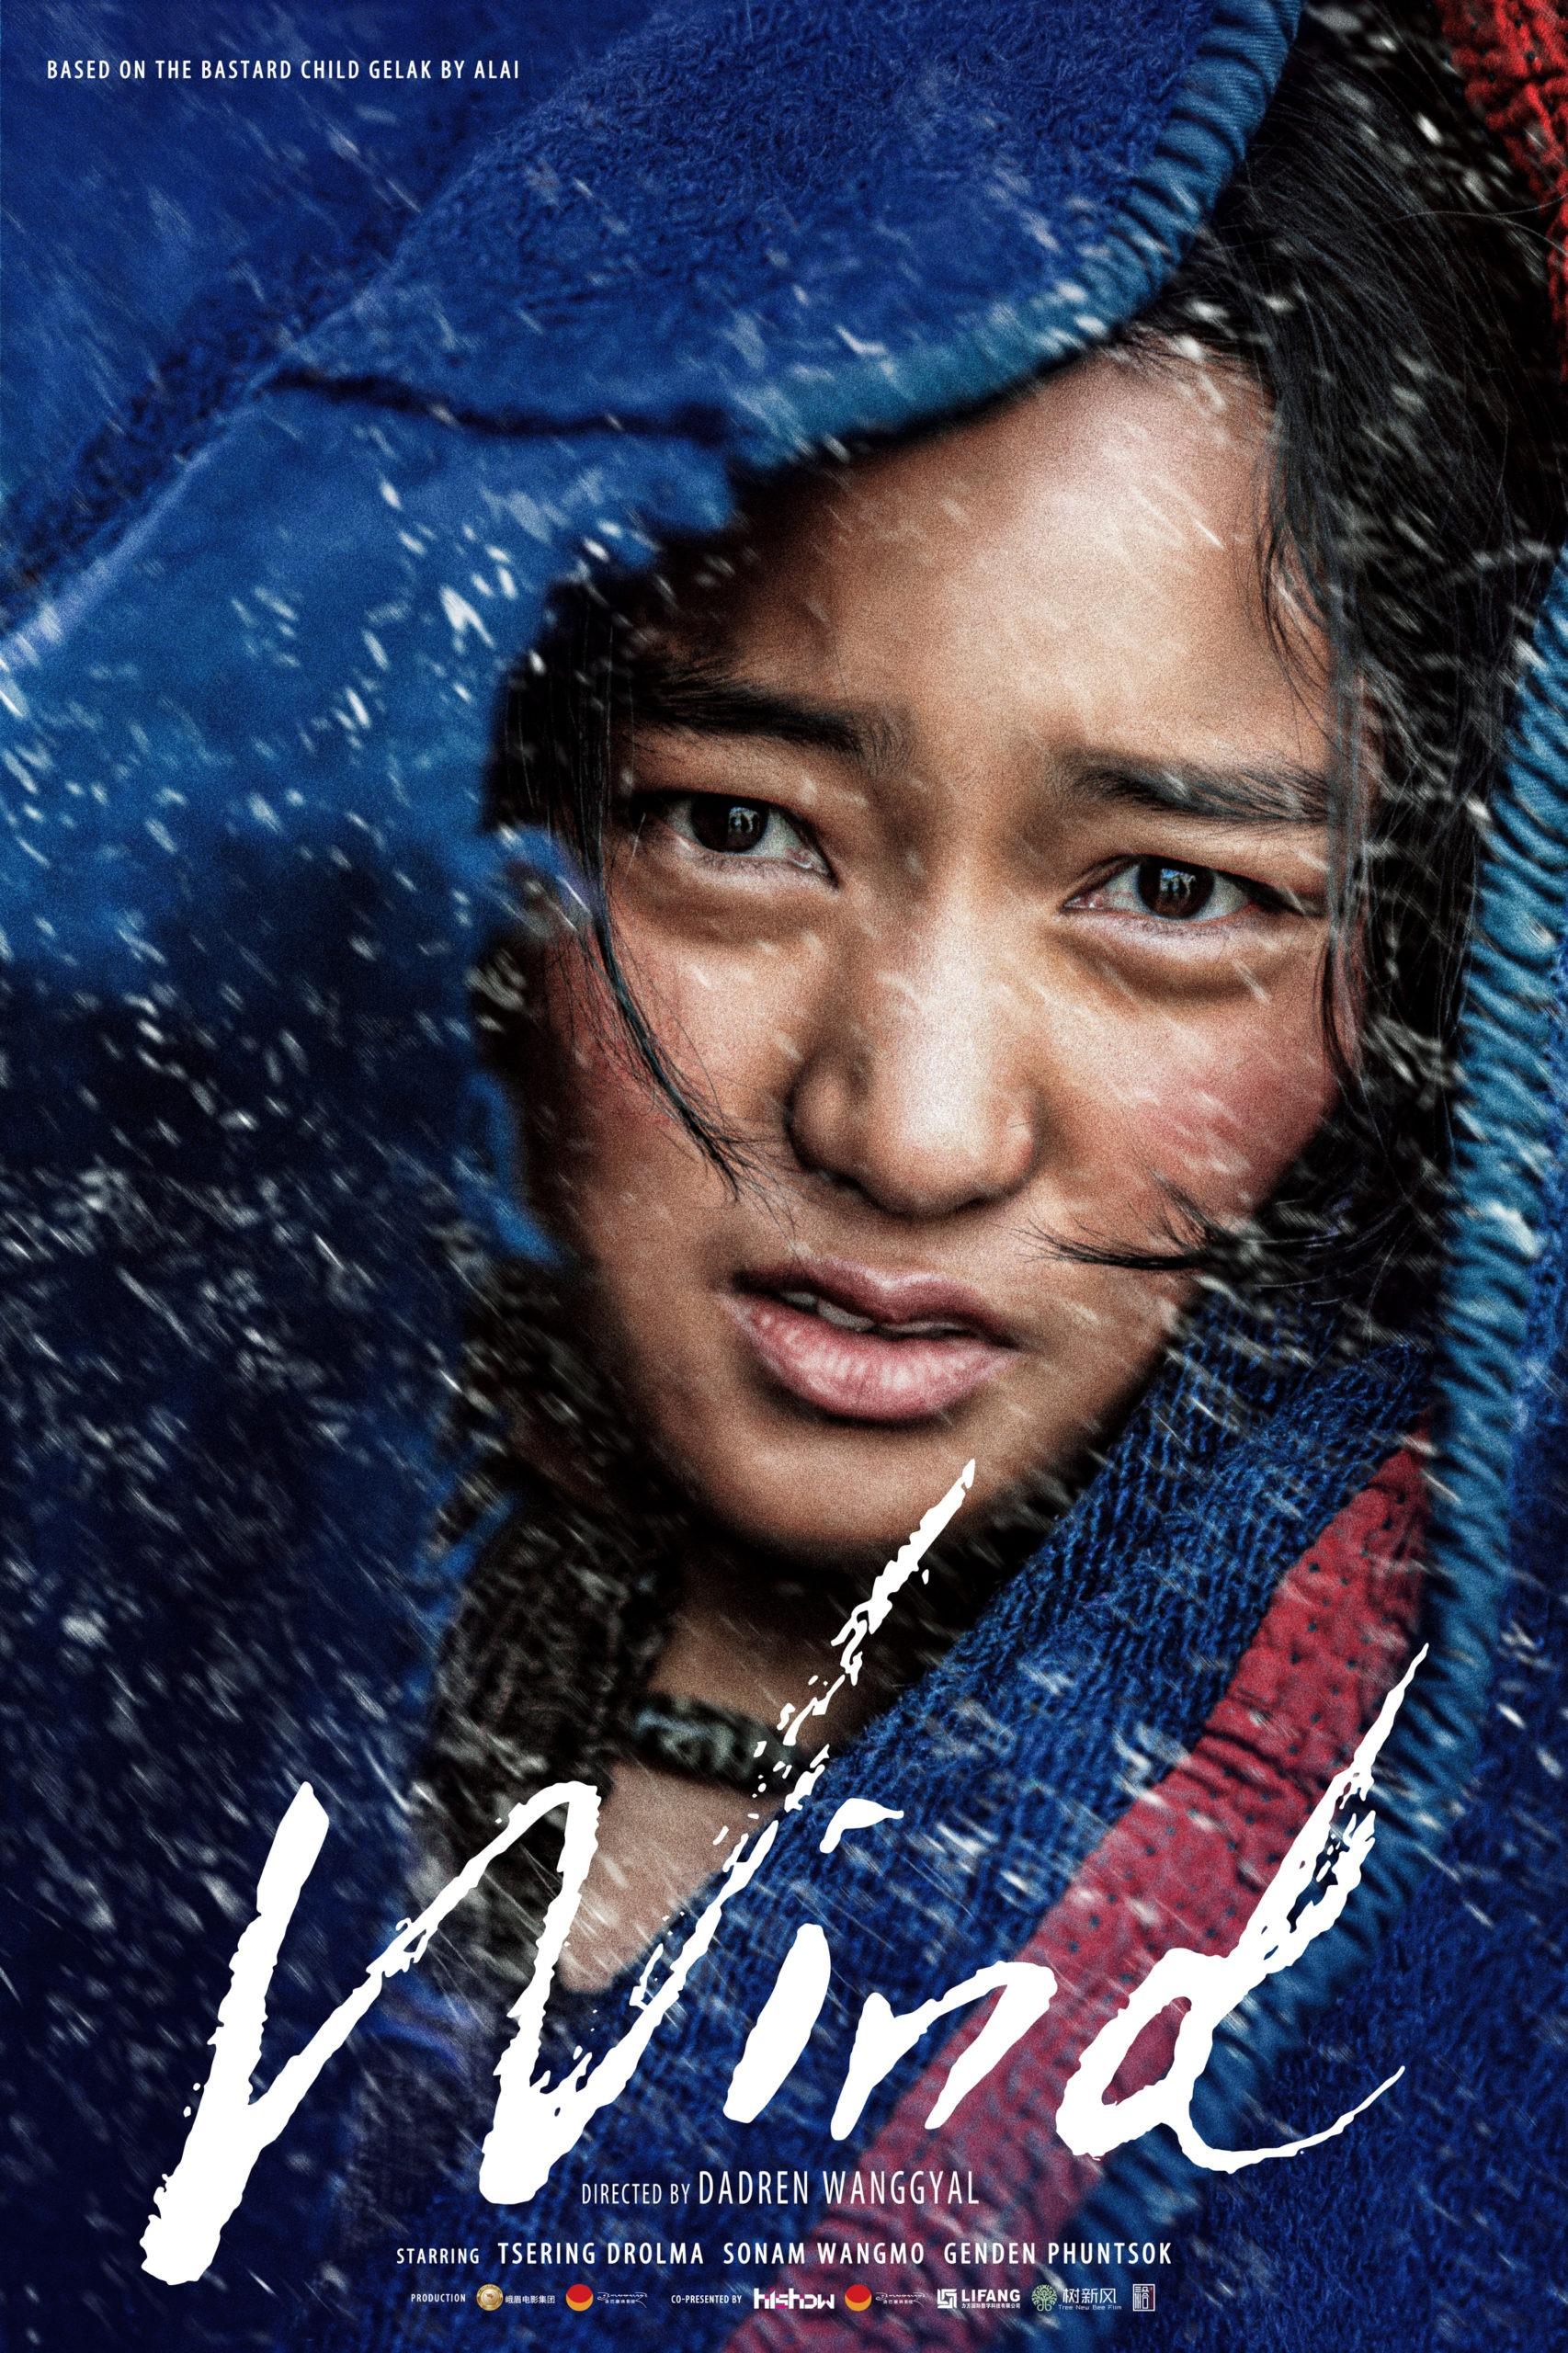 Wind - Poster (clean) - Qianmeng LIU